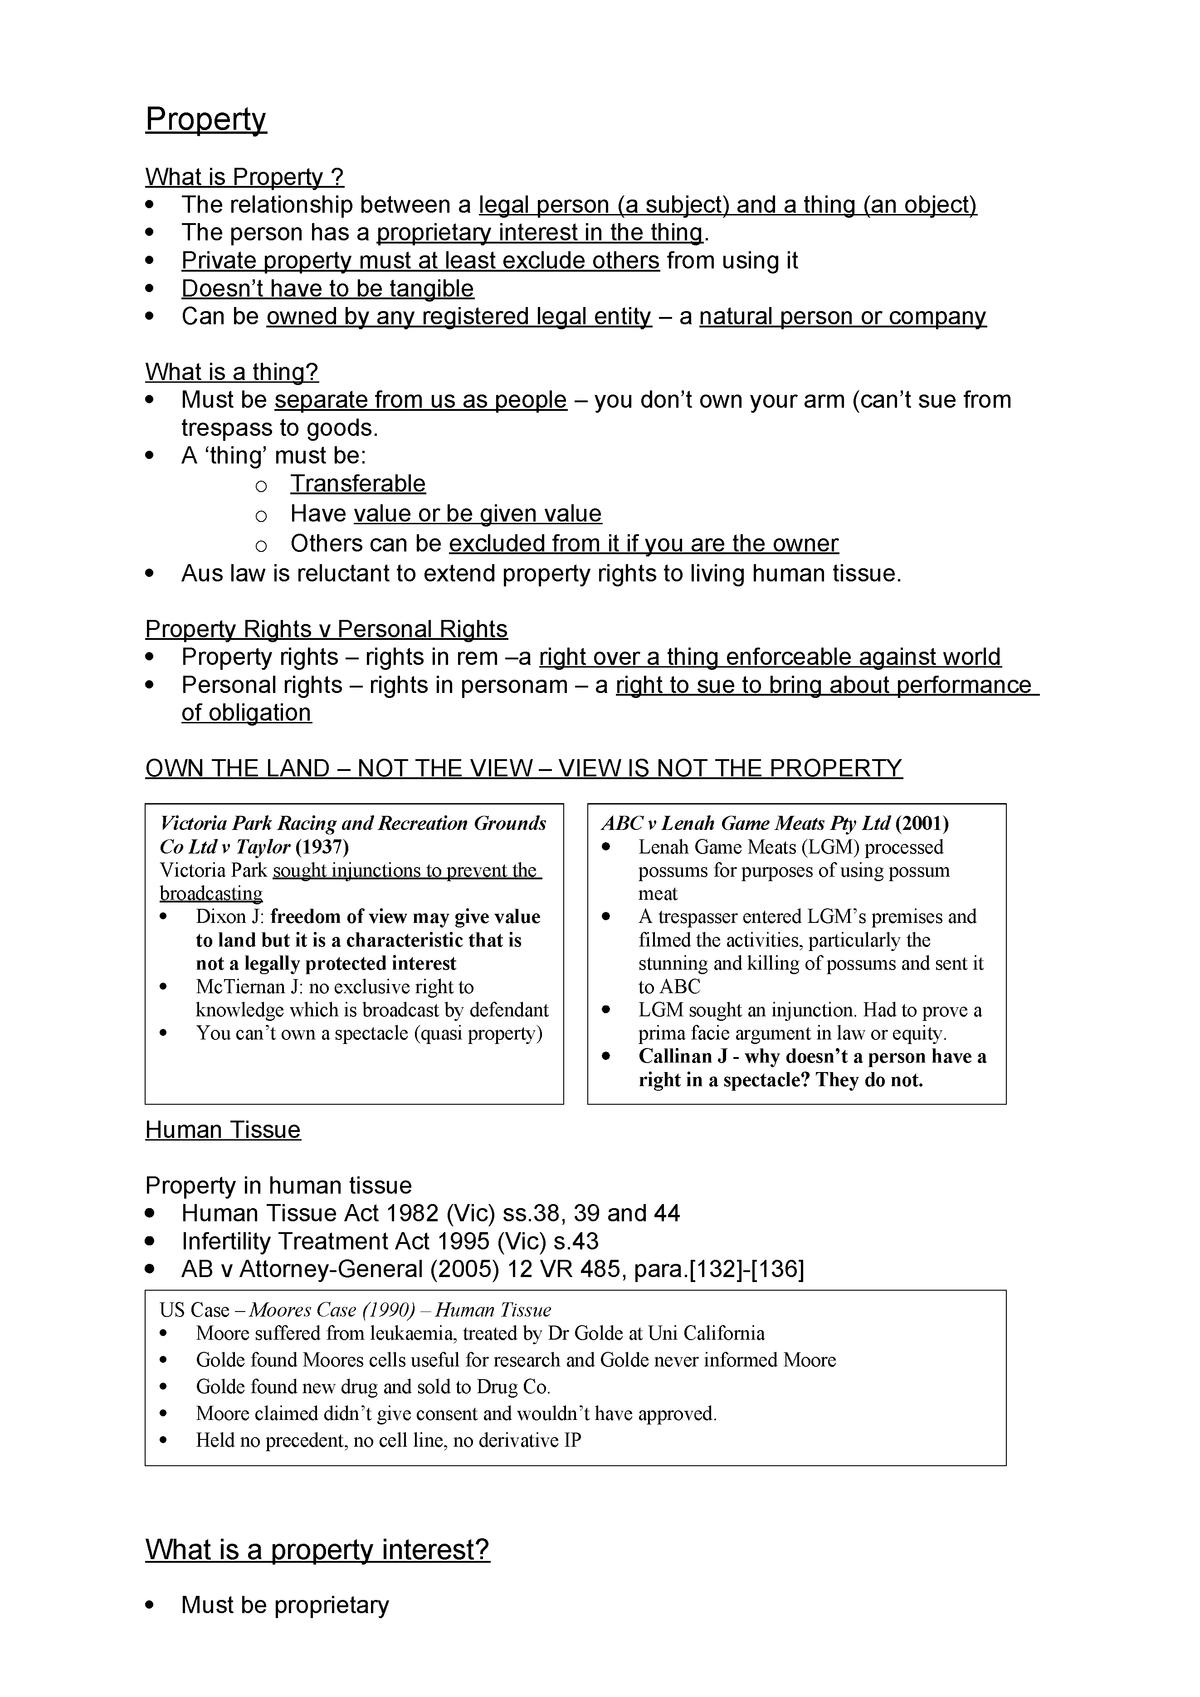 Basic Property Law - 311961 - StuDocu